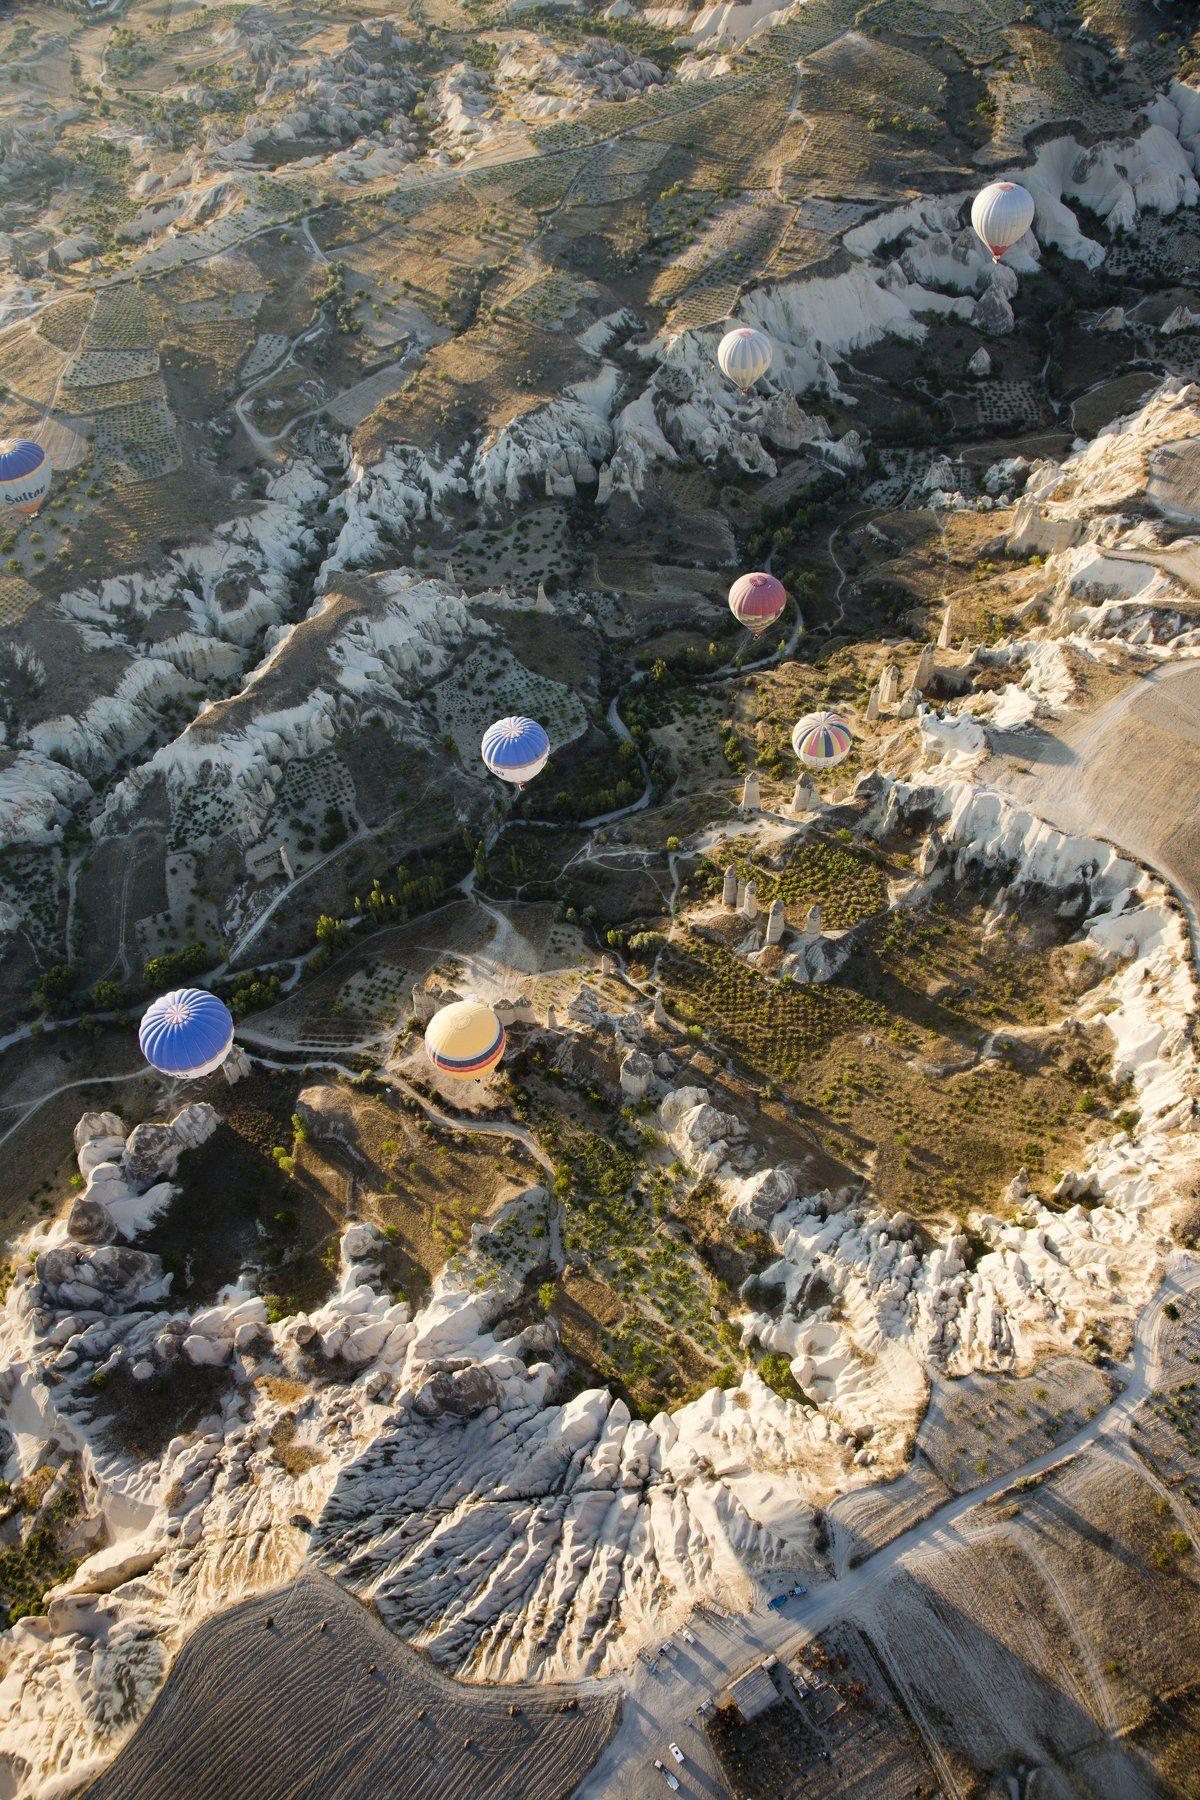 полёт, путешествие, шар,земля, рельеф,ландшафт,пейзаж,landscape,travel,fly,balloon,earth,cappadocia, Грачёв Олег